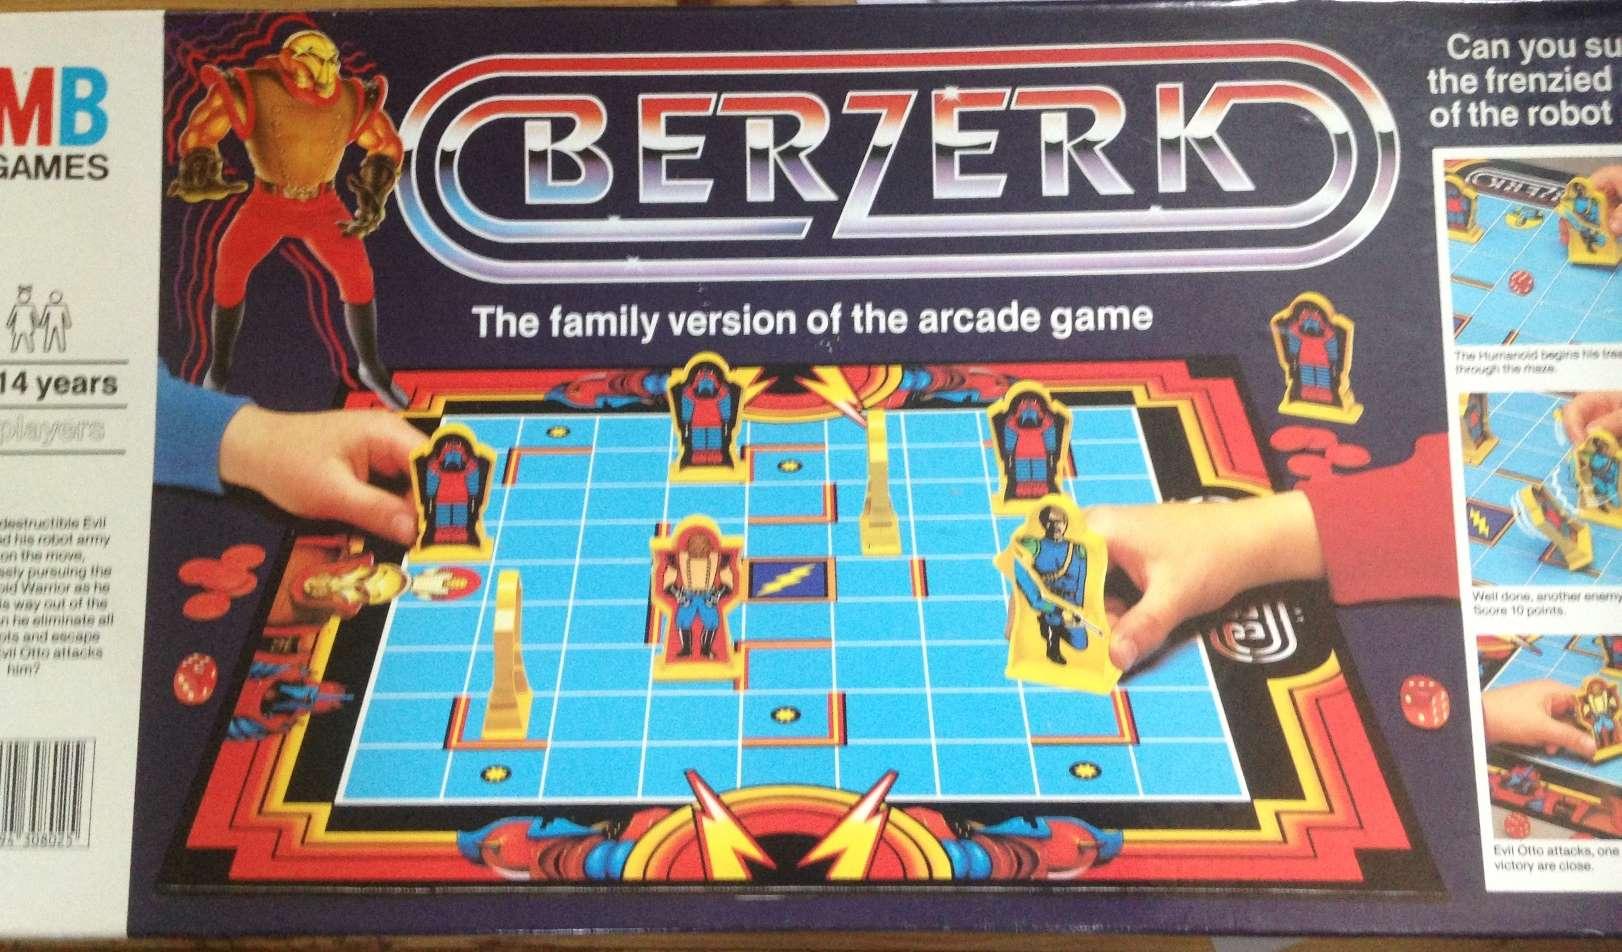 Berzerk gioco da tavolo mb giochi - Blokus gioco da tavolo ...